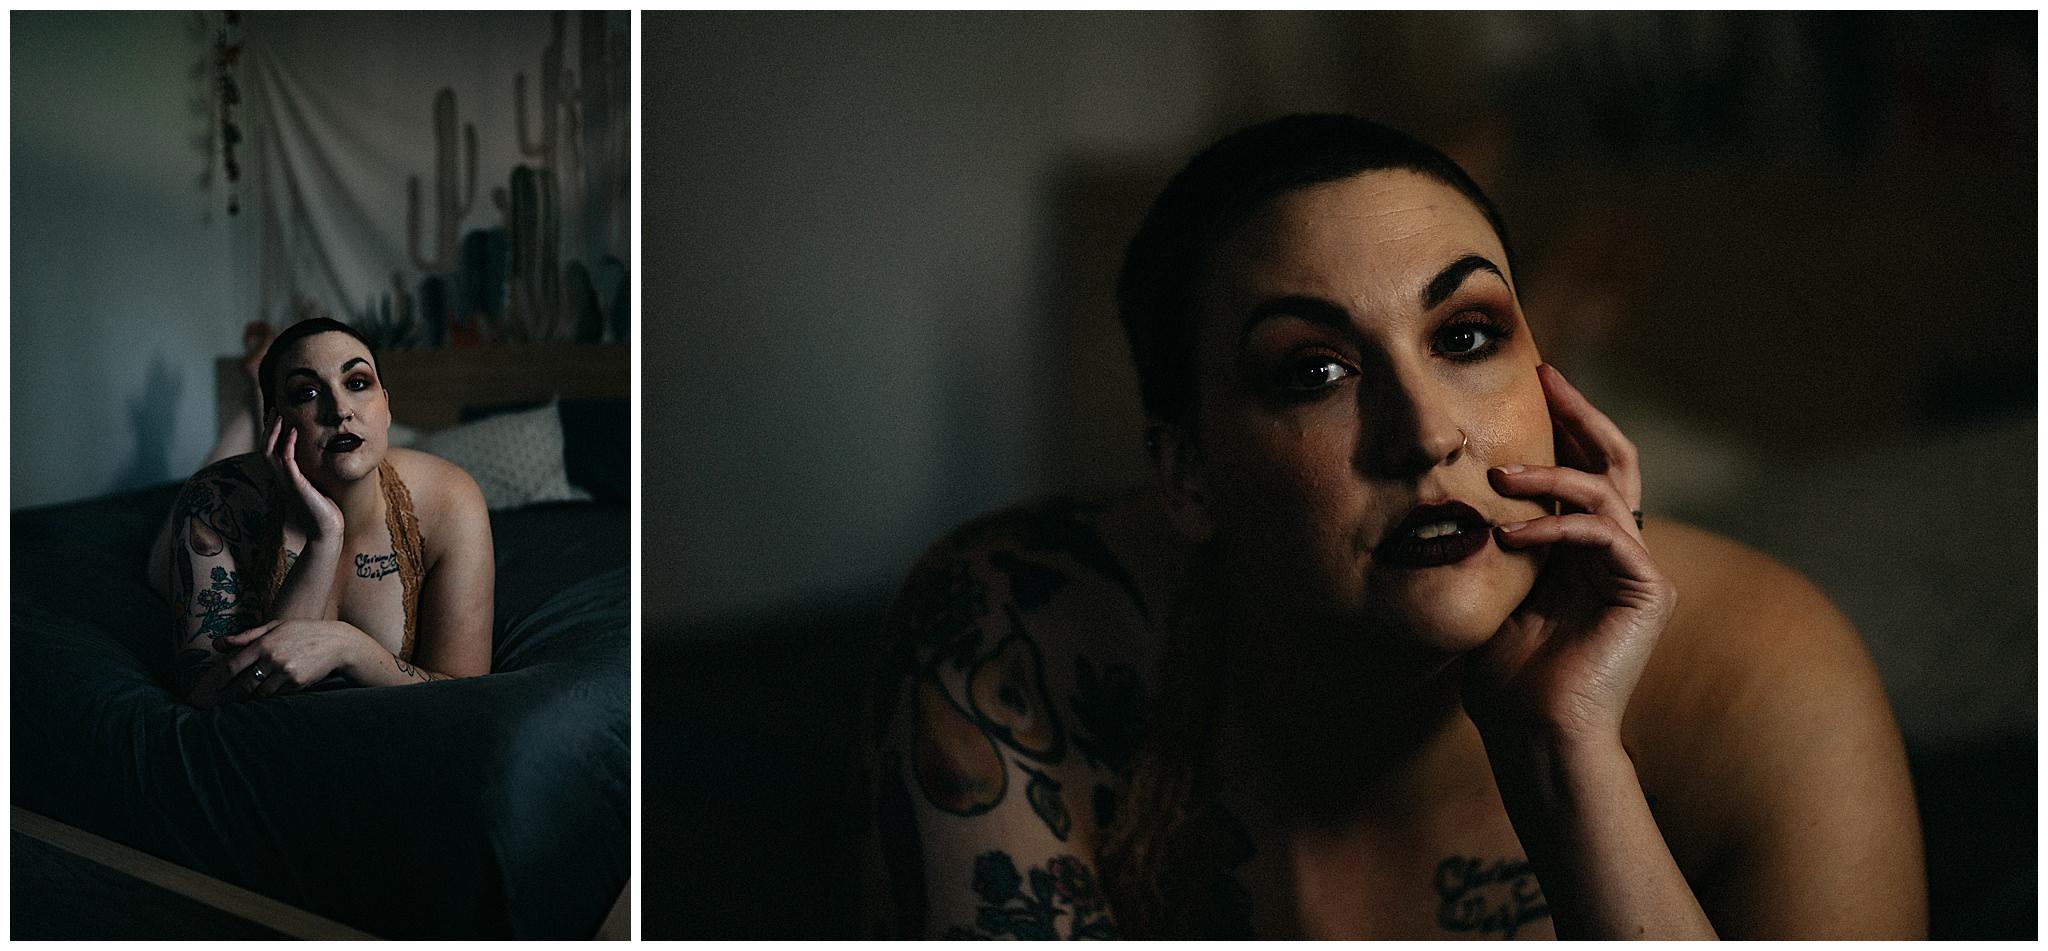 seatac-in-home-boudoir-portraits-kendall-fat-babe-boudoir17.jpg